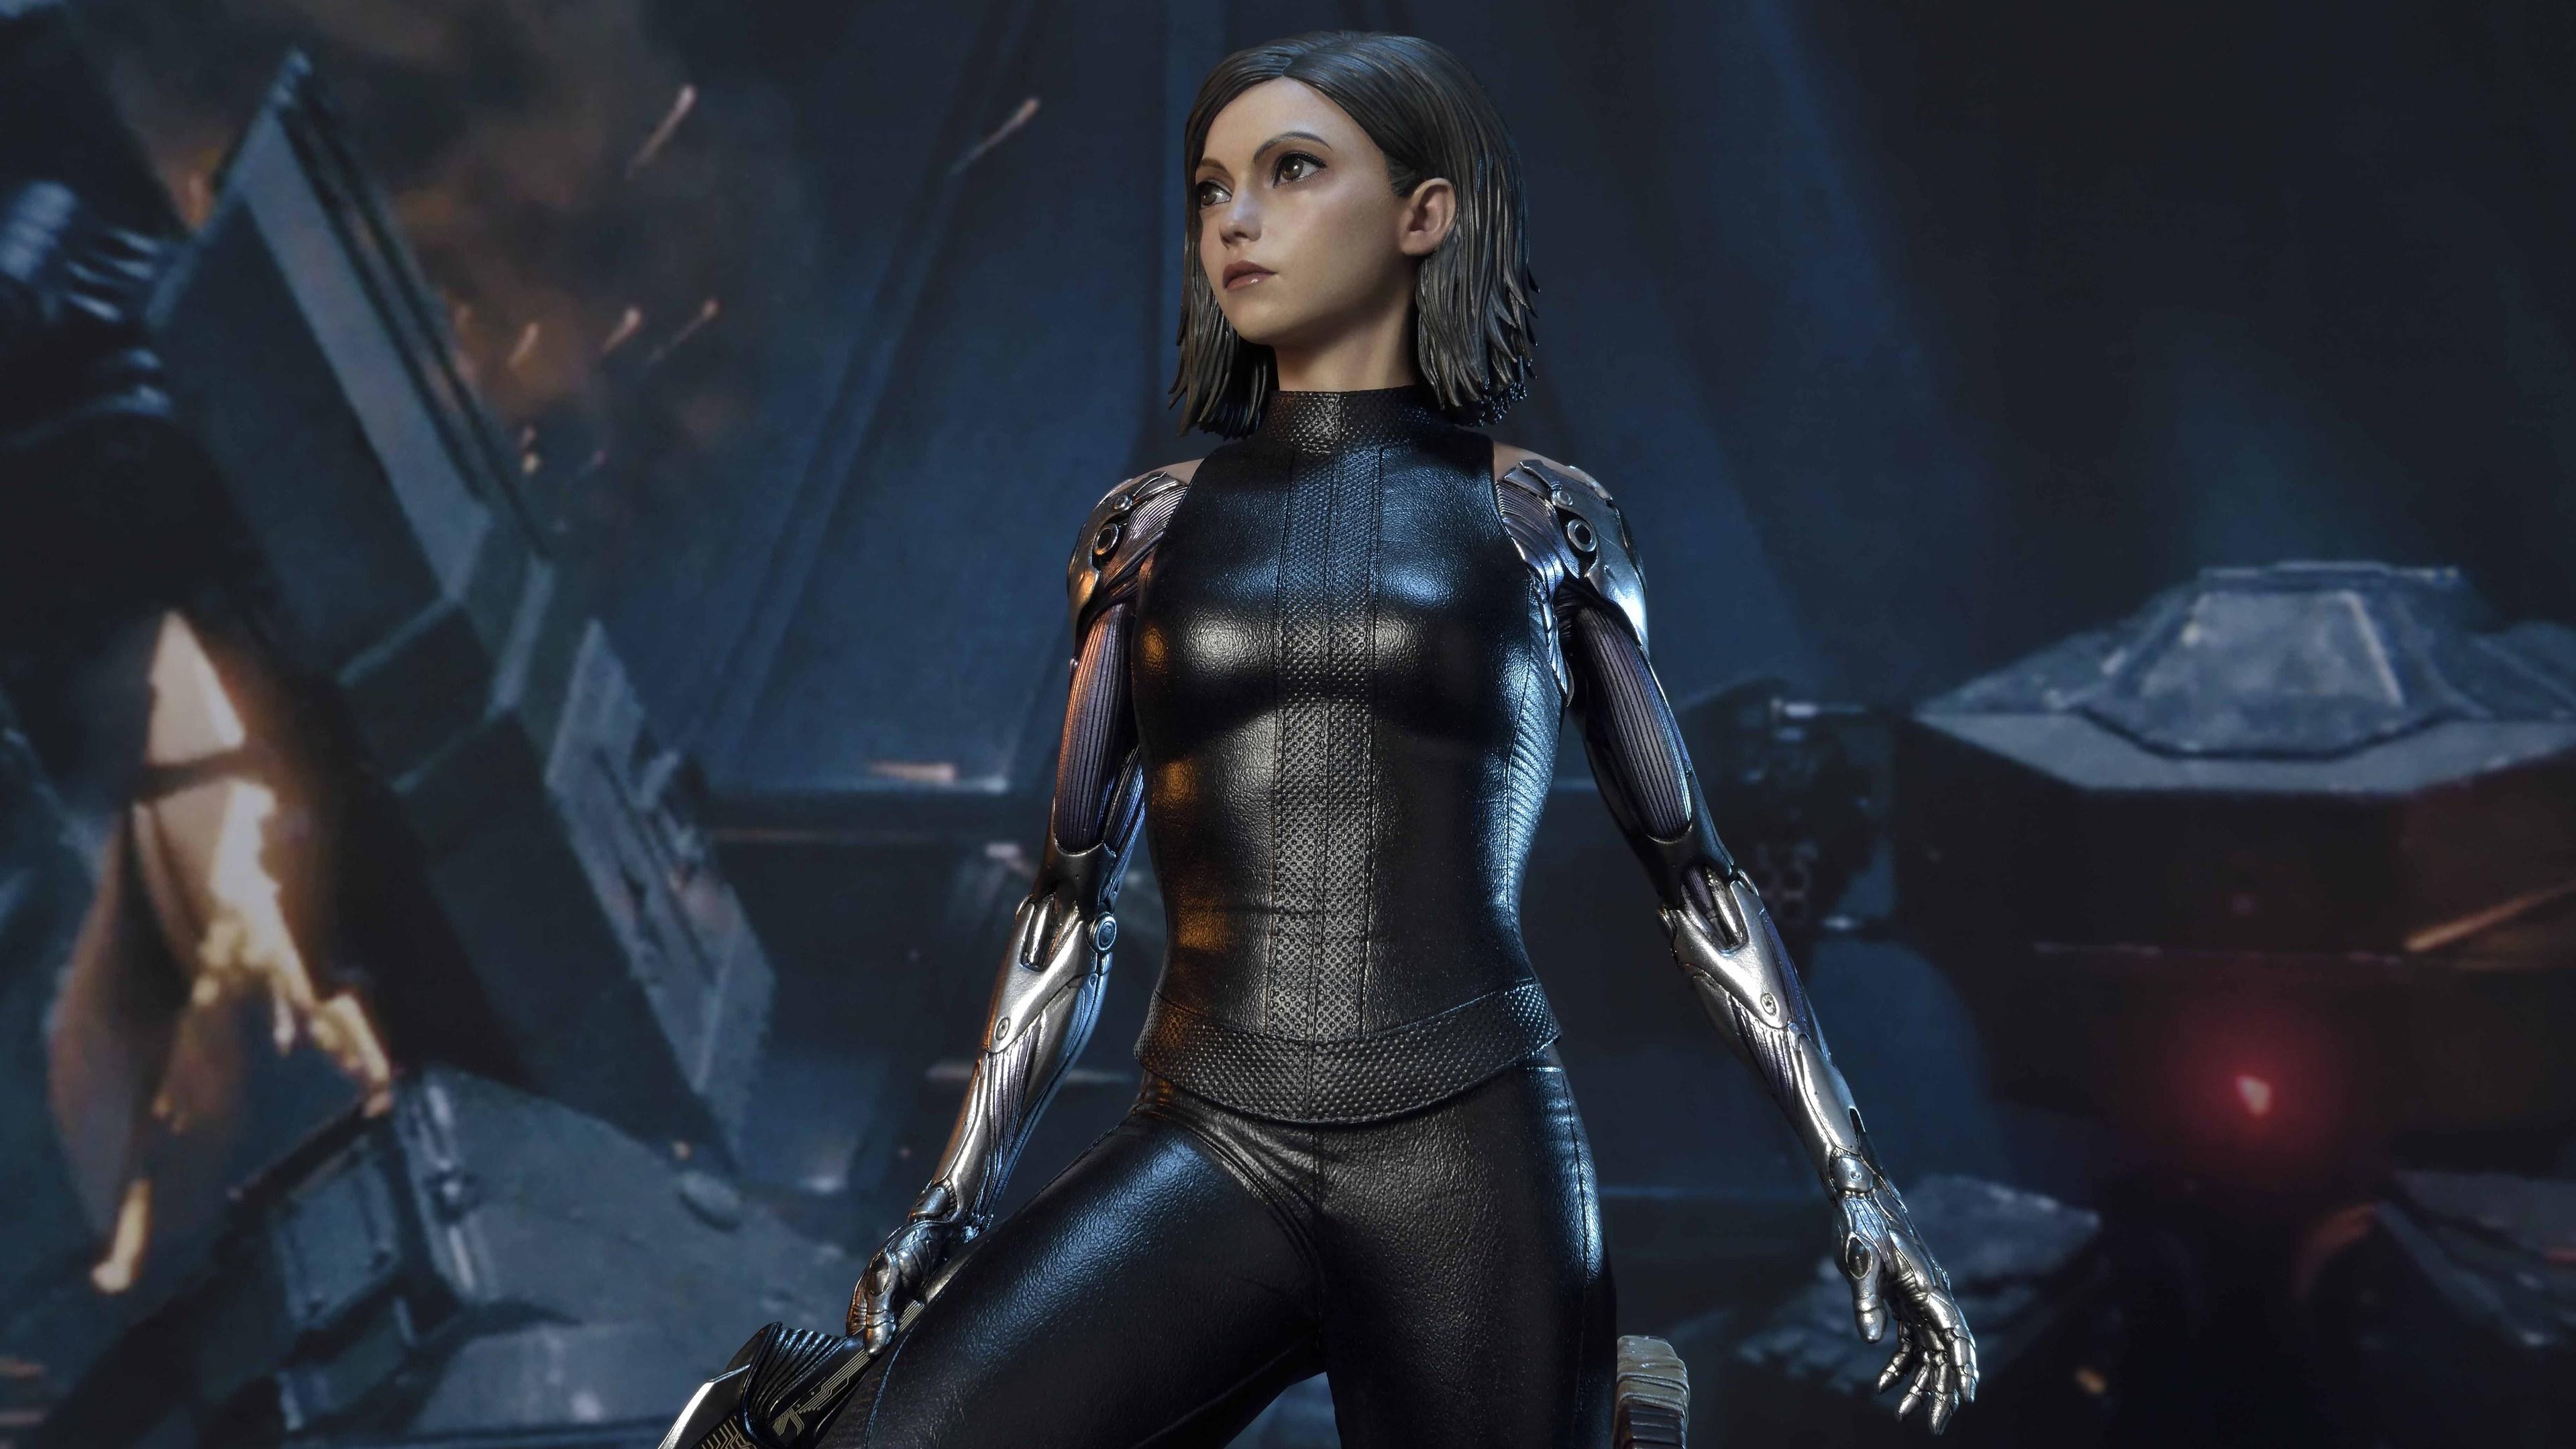 2048x2048 Mera Aquaman Movie Poster Ipad Air Hd 4k: Alita Battle Angel 2019 4k Movies Wallpapers, Hd